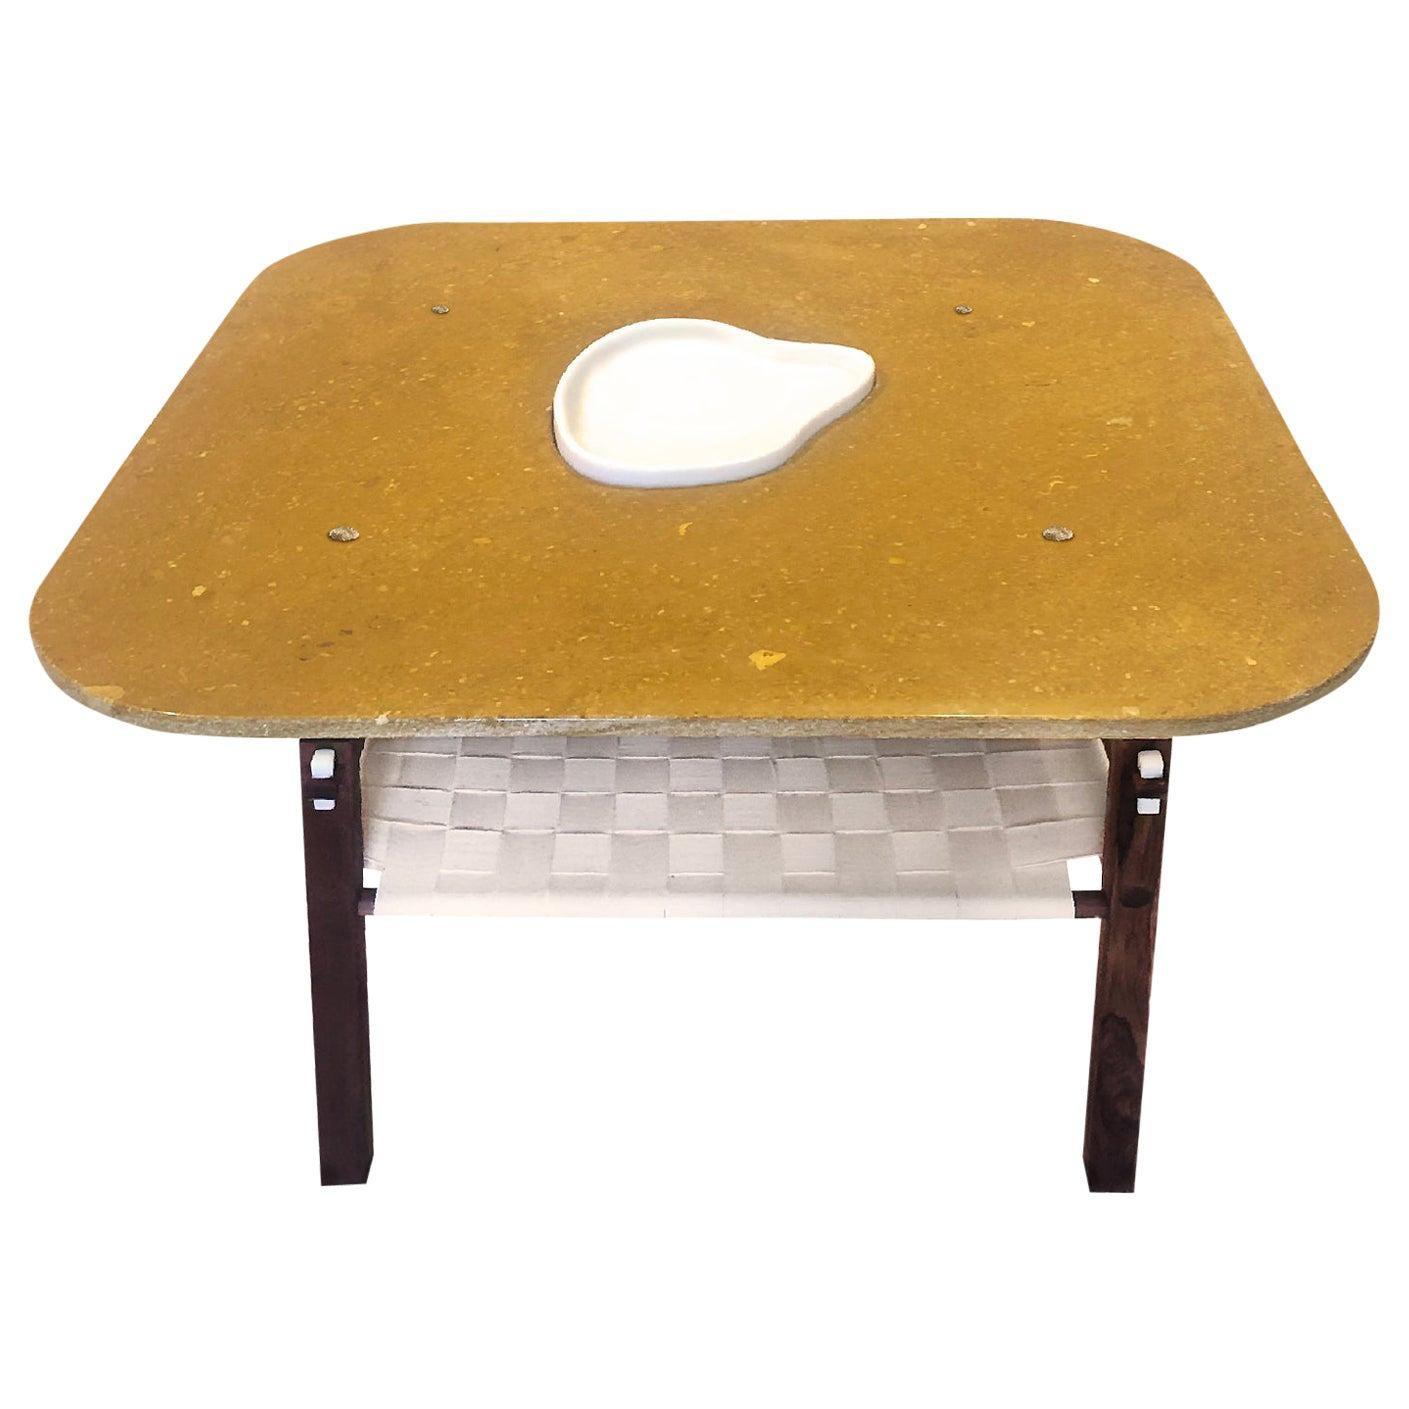 Pleyel, a Marble and Wood Coffee Table, Matang